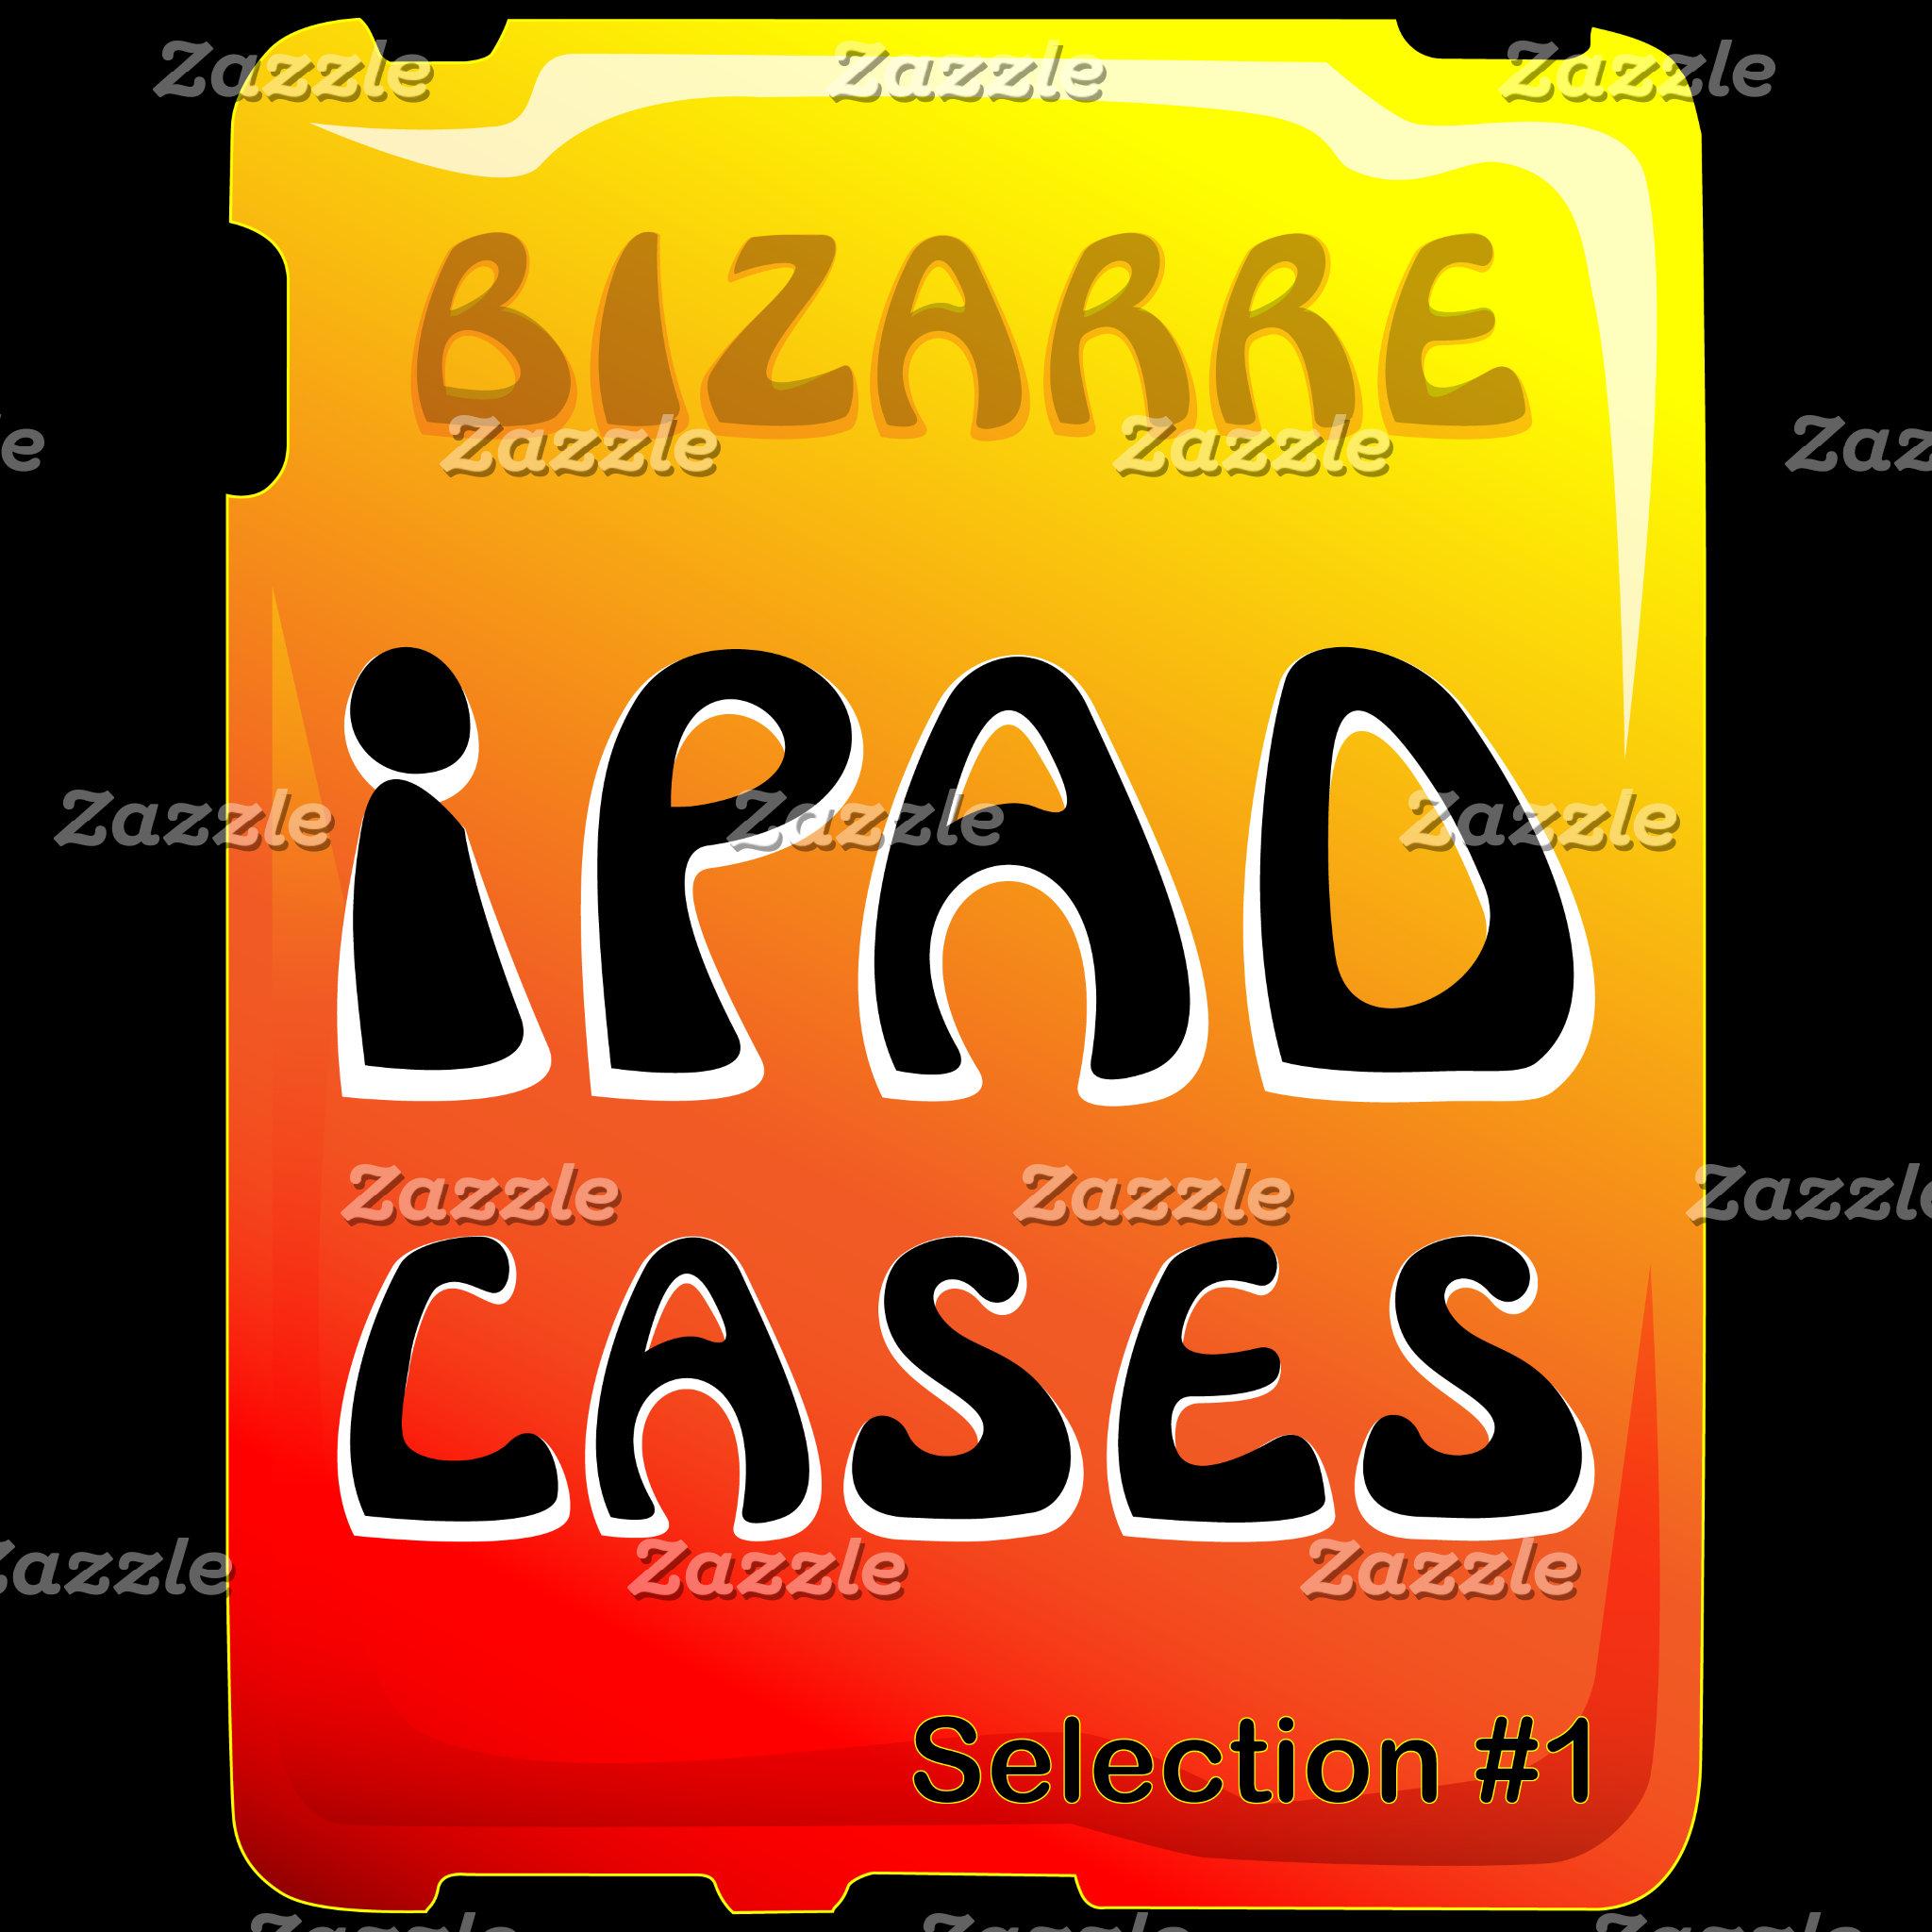 Bizarre iPAD CASES #1